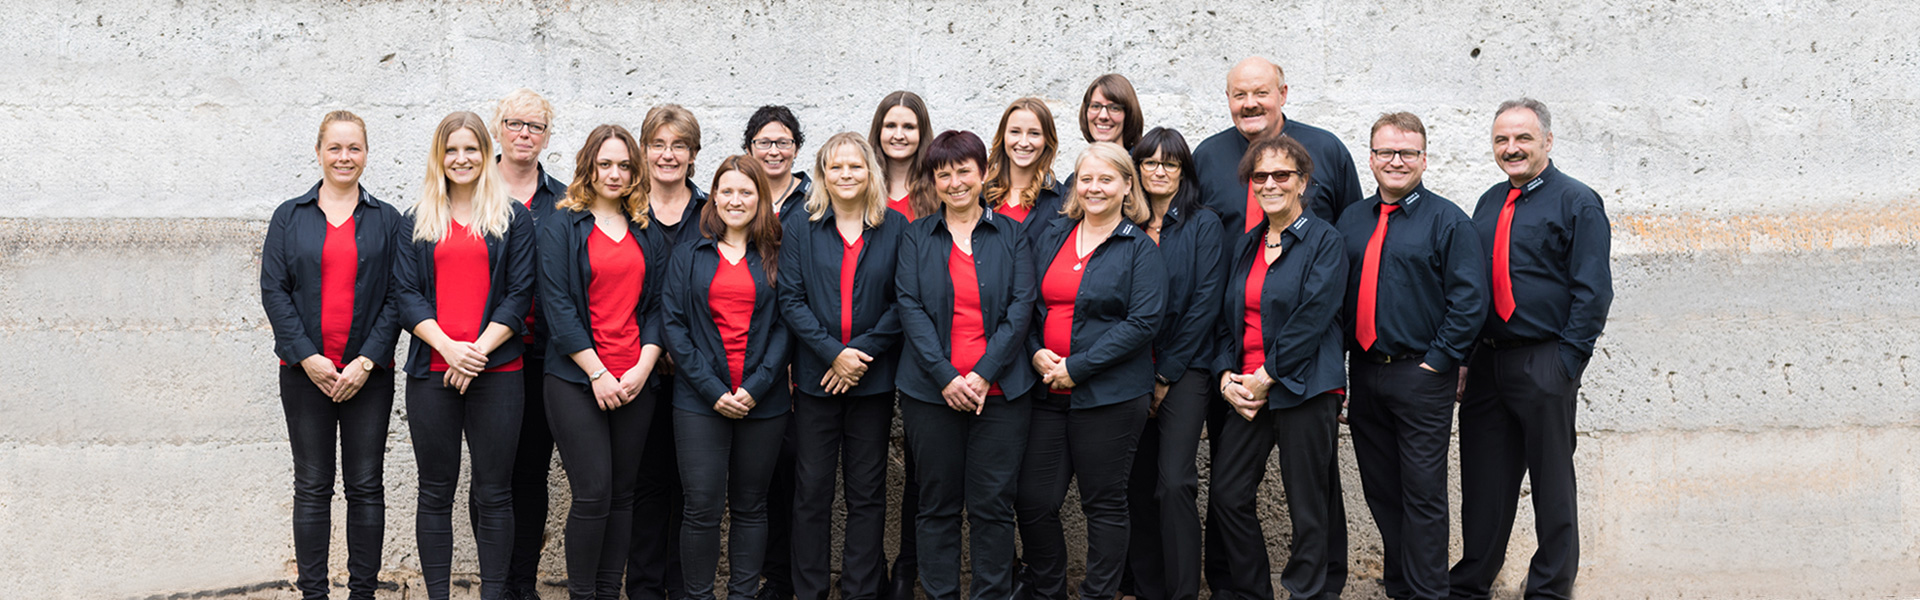 Dream and Harmonie, Chor Ertingen